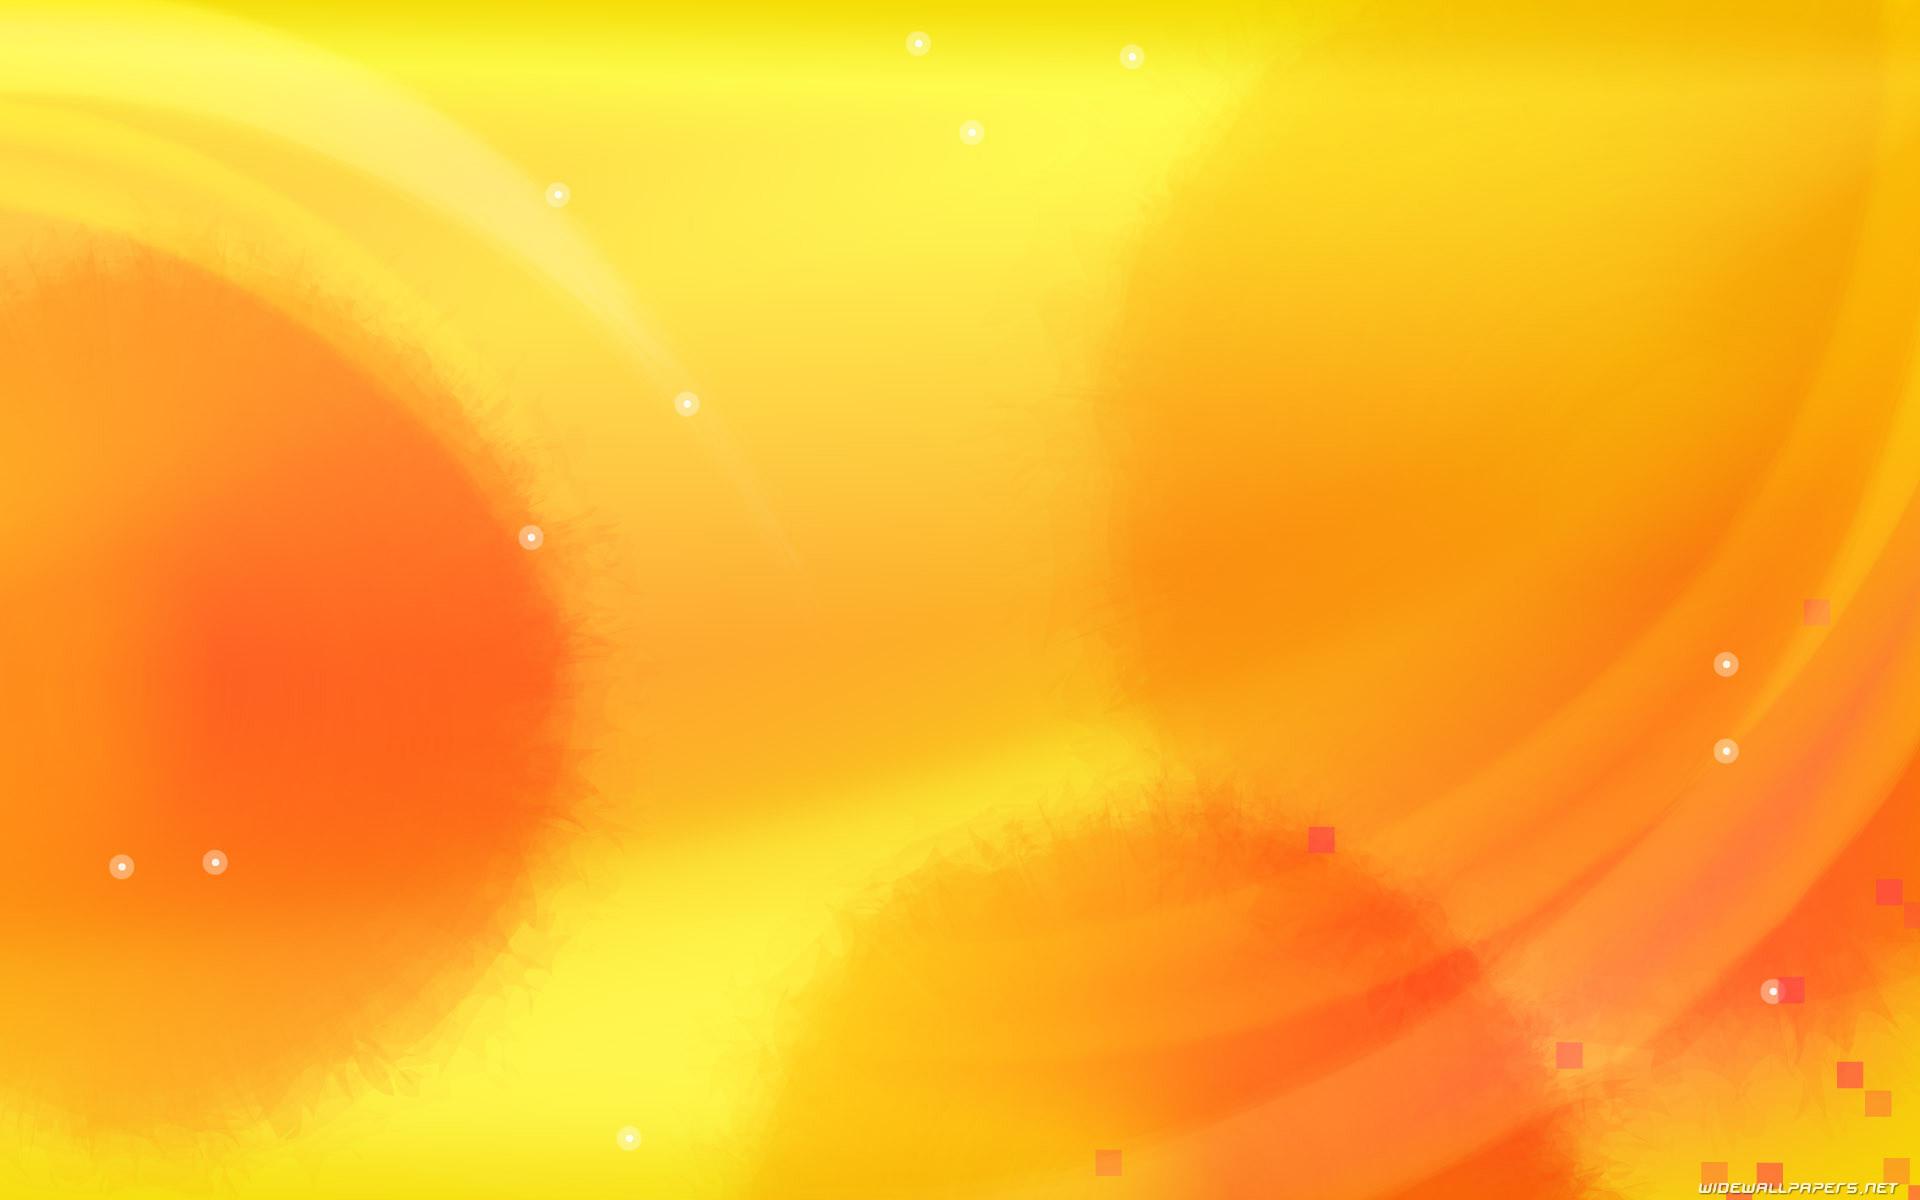 Light Yellow Orange – See more similiar images at backgroundimages.biz · Background  Images